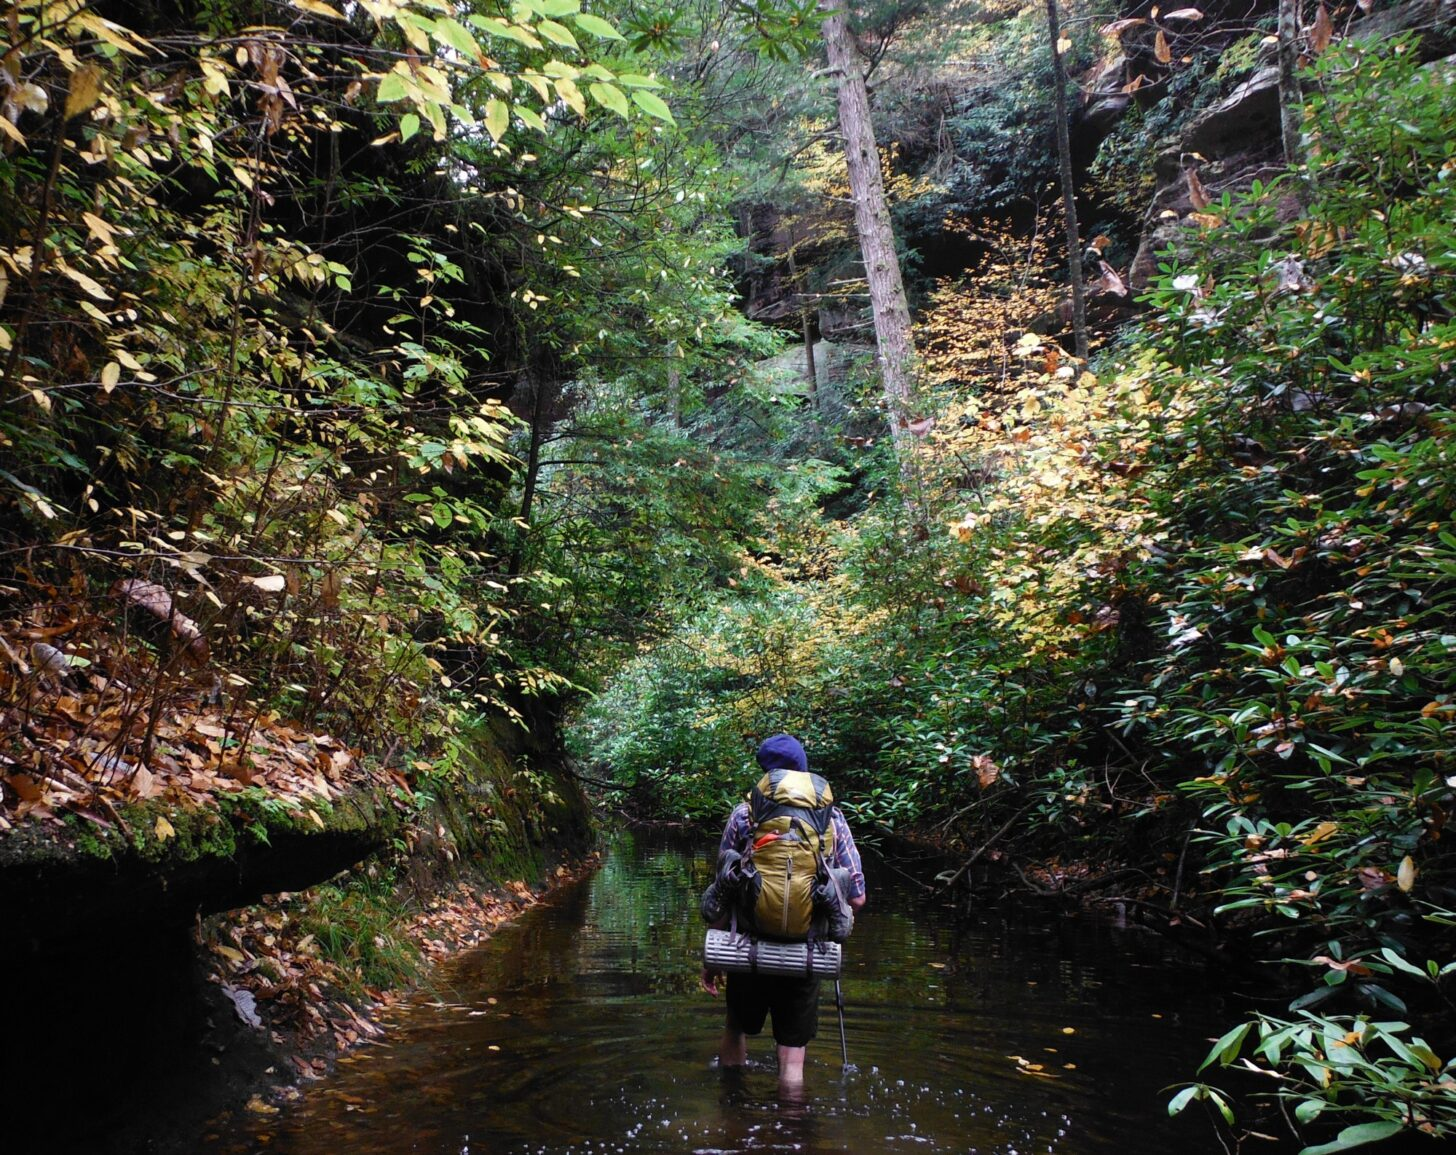 a man wades through a creek, walking away from the camera.